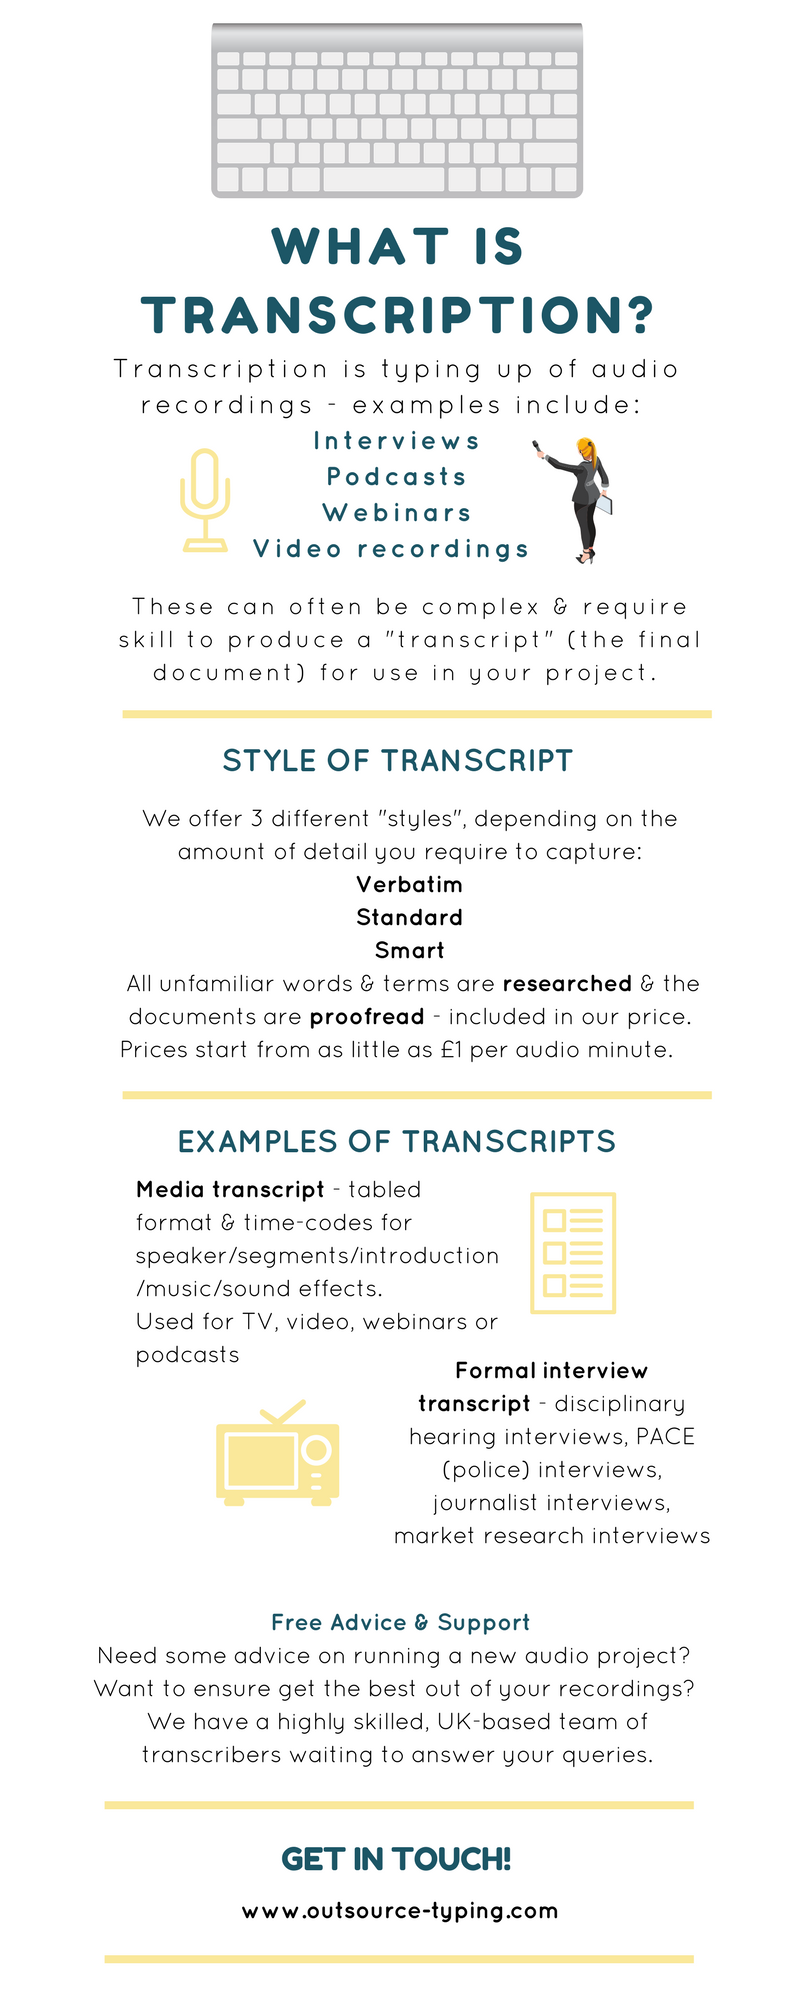 Transcription Blog | VA Blog | Outsource Typing Virtual Assistant